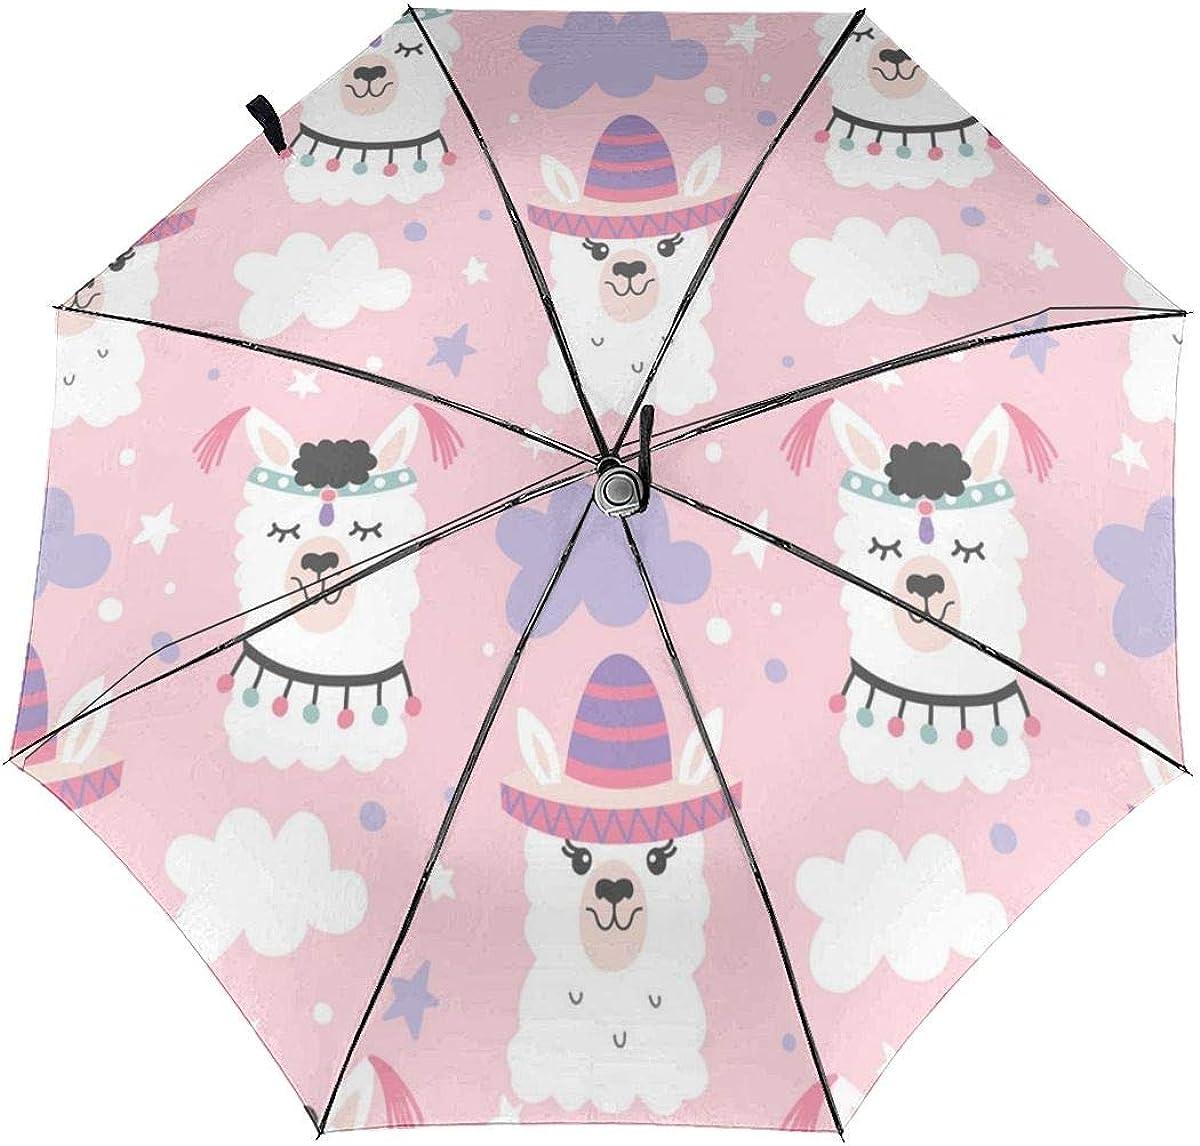 Cartoon Llama Alpaca Seamless Pattern Compact Travel Umbrella Windproof Reinforced Canopy 8 Ribs Umbrella Auto Open And Close Button Personalized